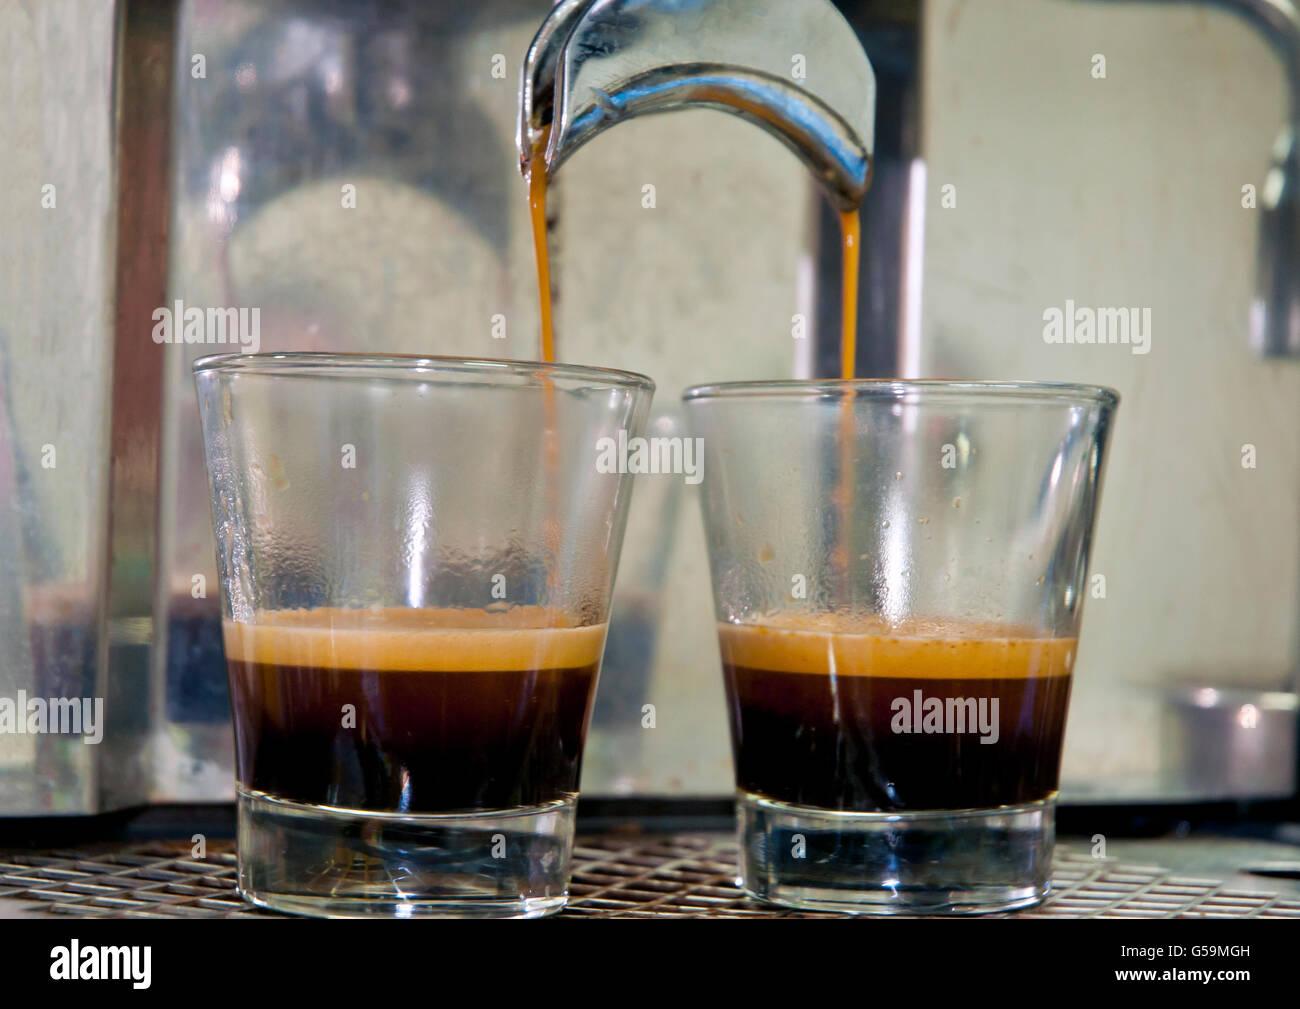 Espresso machine maker - Stock Image